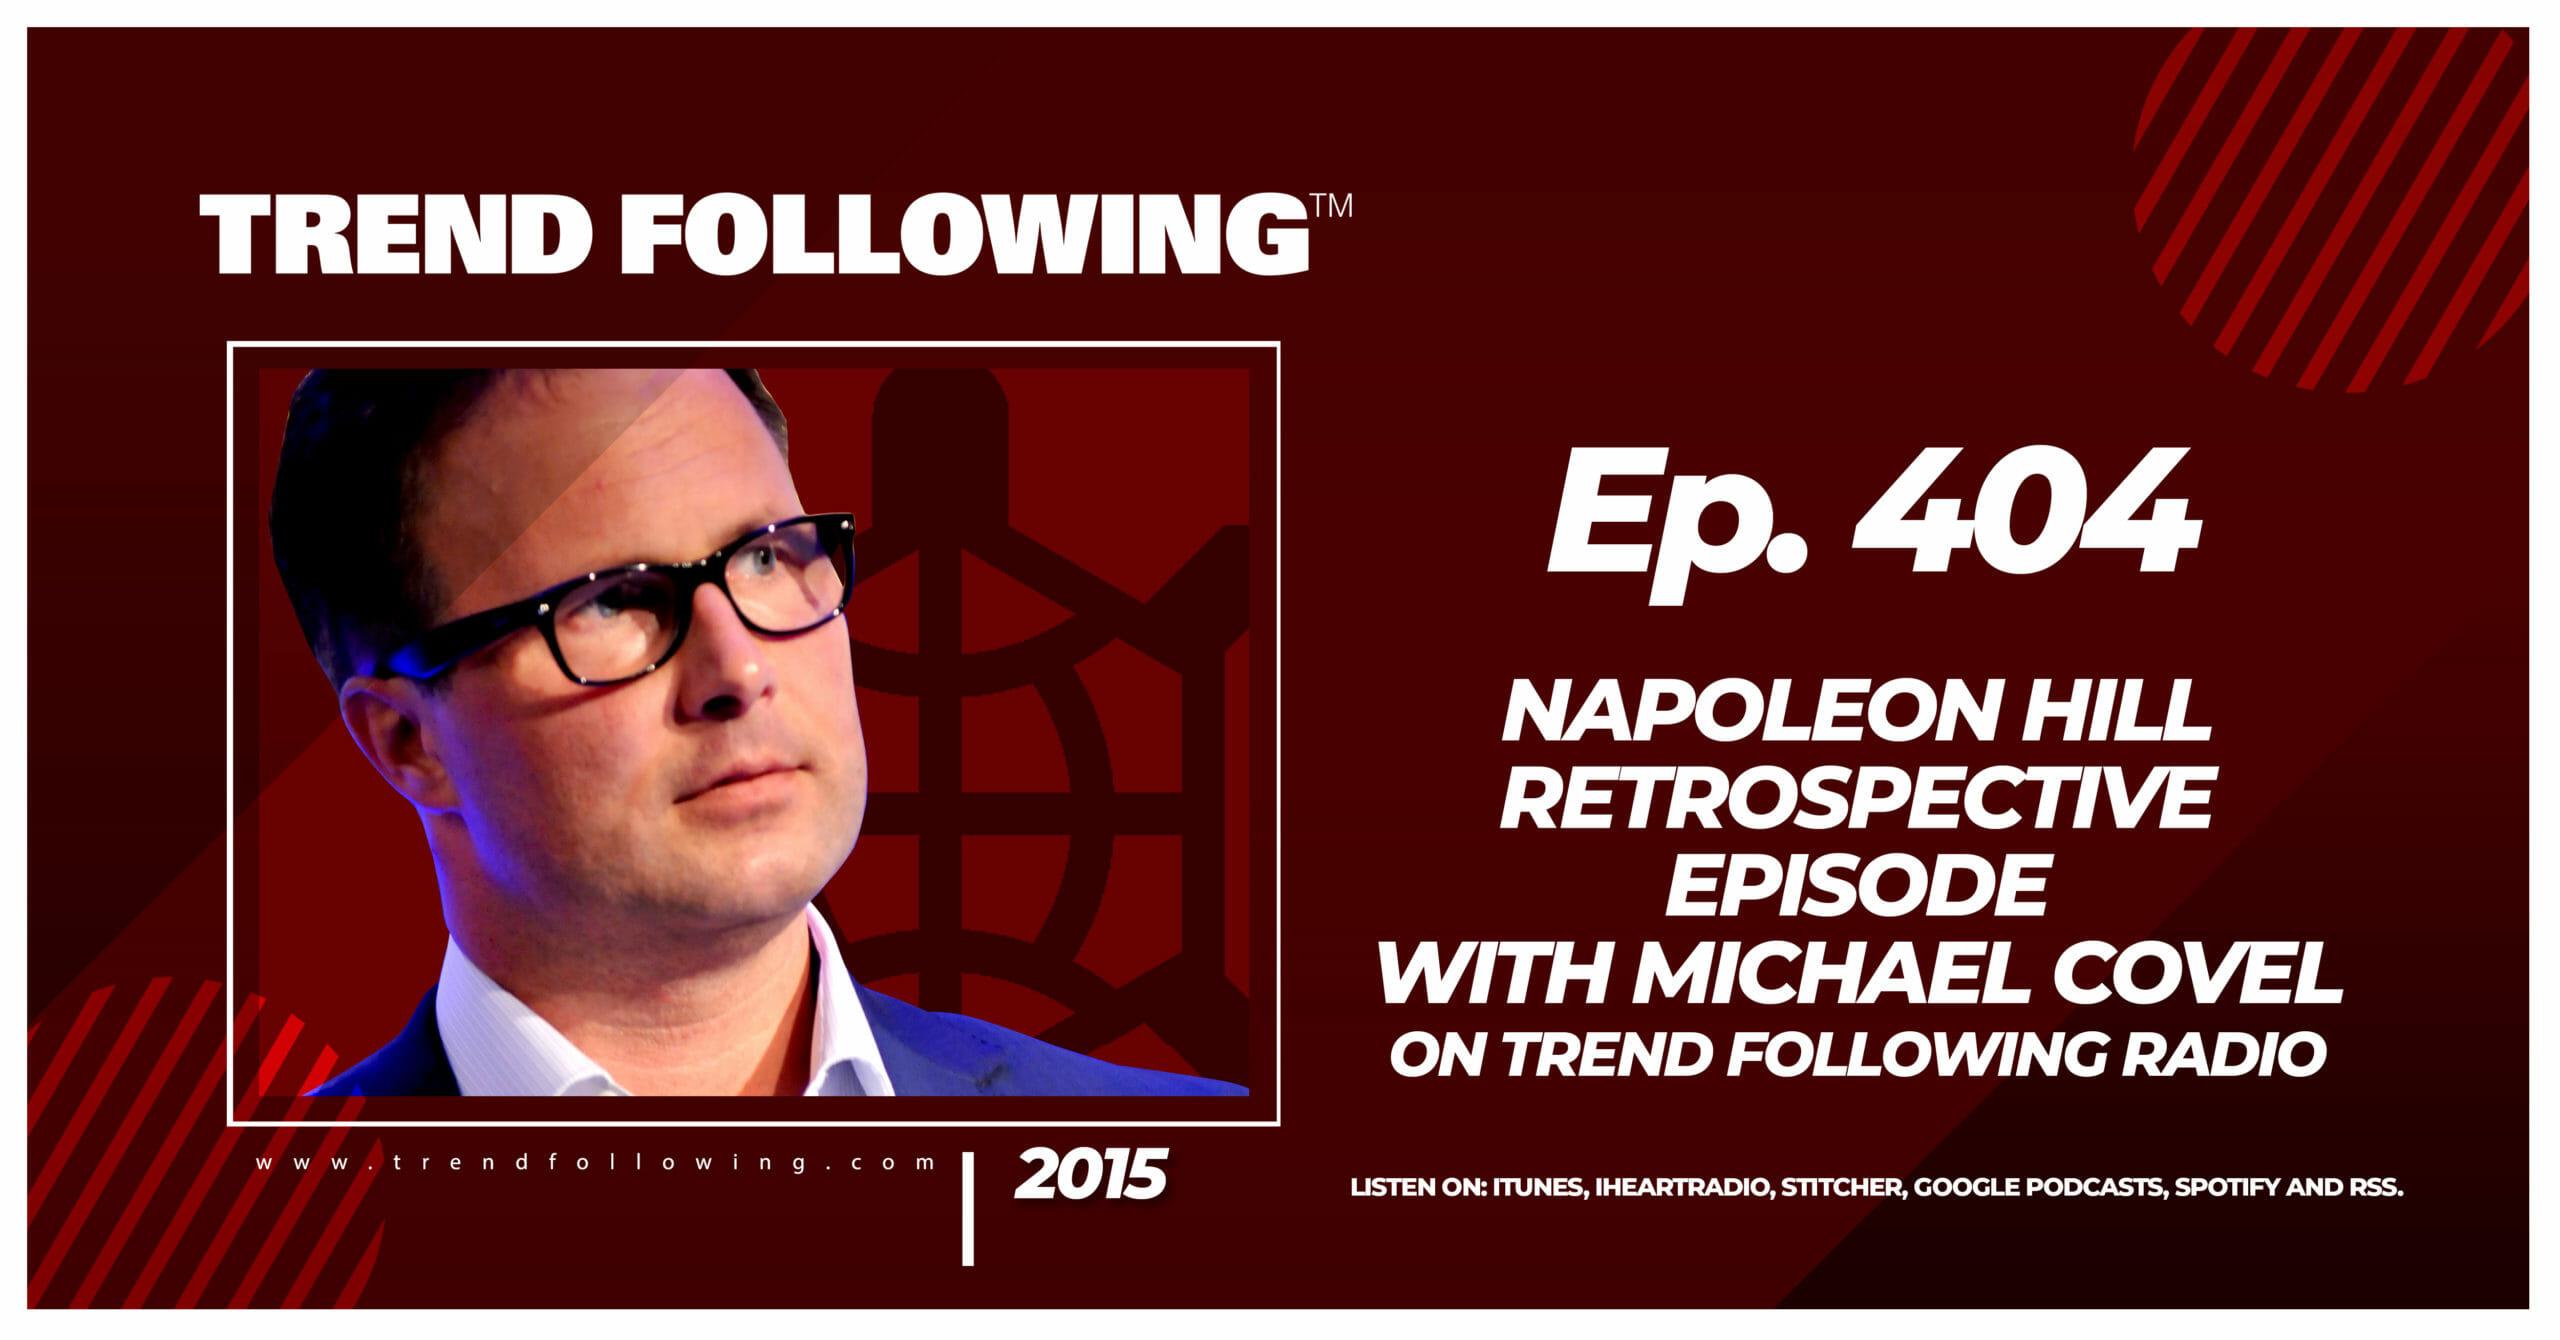 Napoleon Hill Retrospective Episode with Michael Covel